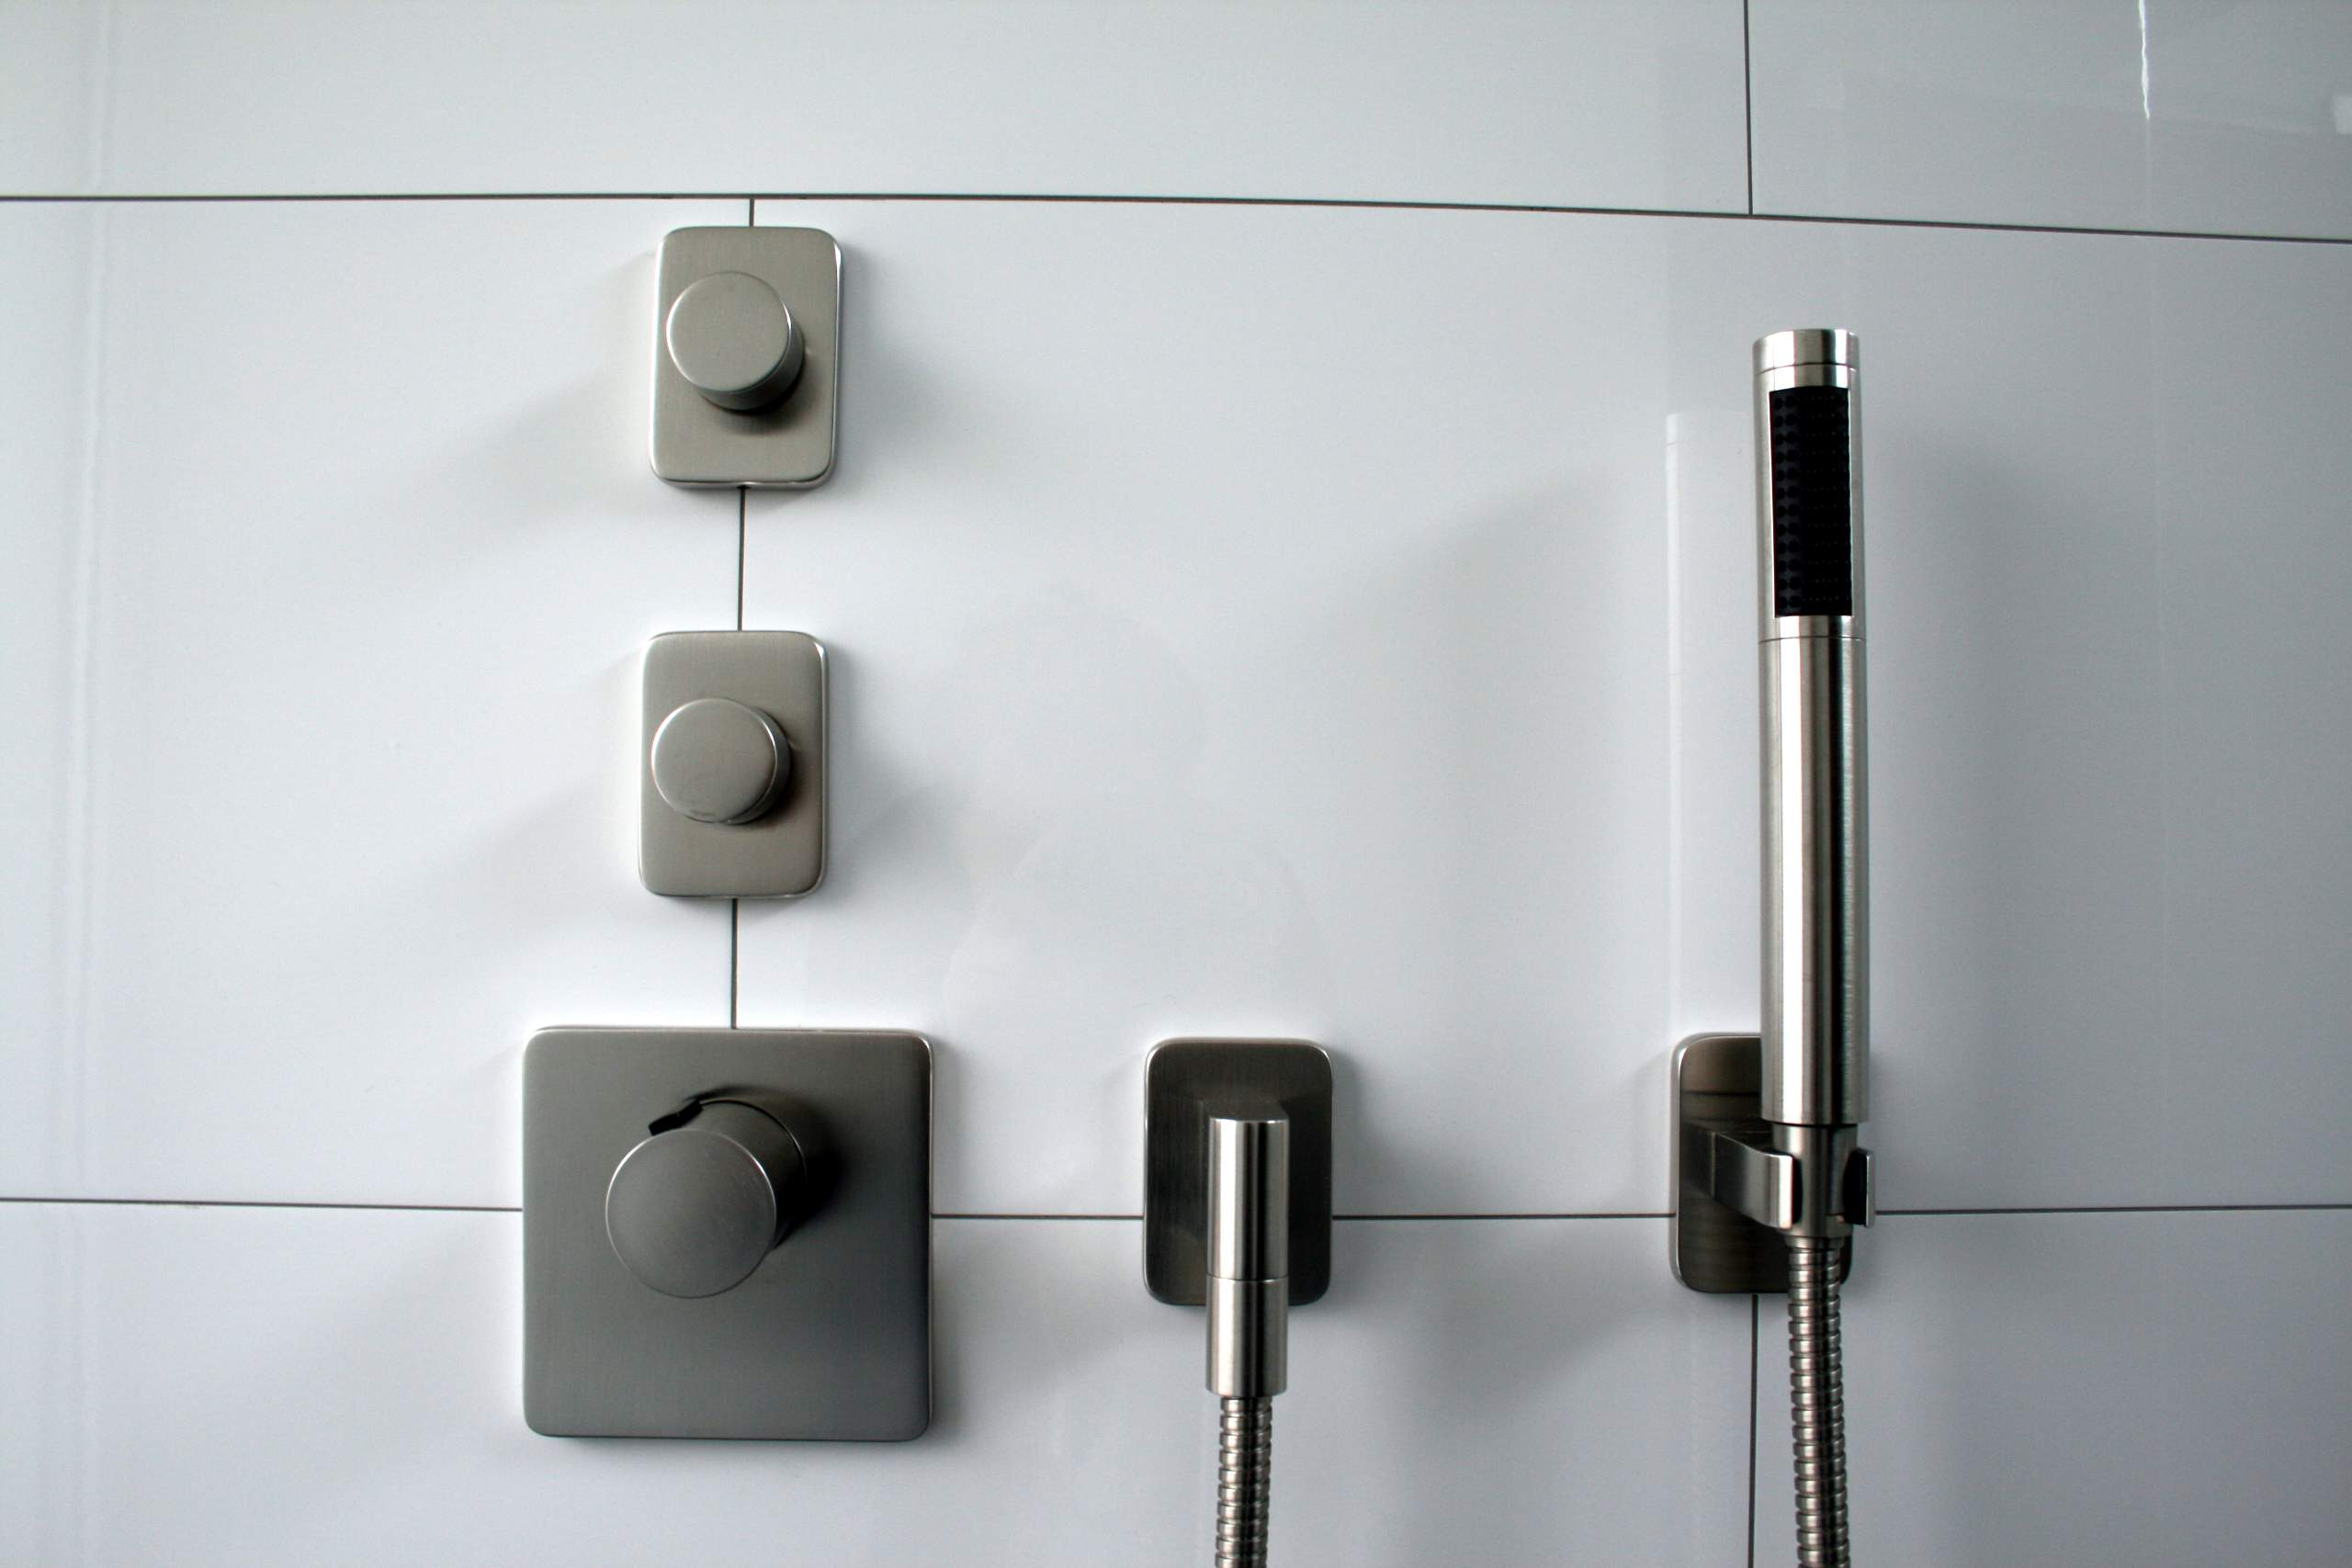 LIEGLER TAKEH ARCHITEKTEN Projekt Dürergasse Bad Detail